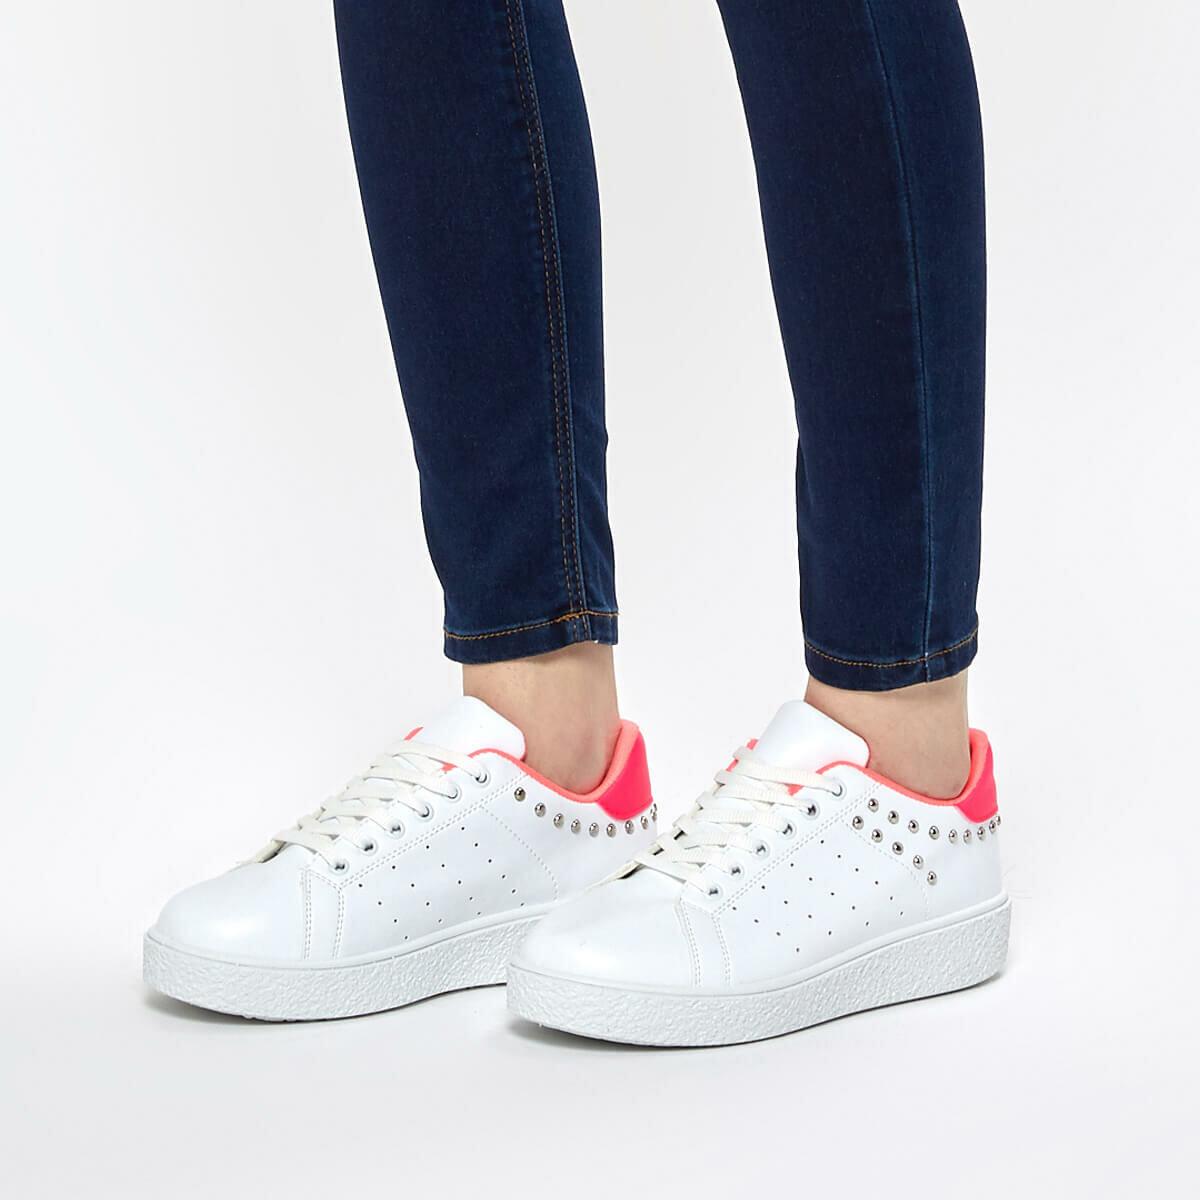 FLO CS19068 Fuchsia Women Sneaker Shoes Art Bella